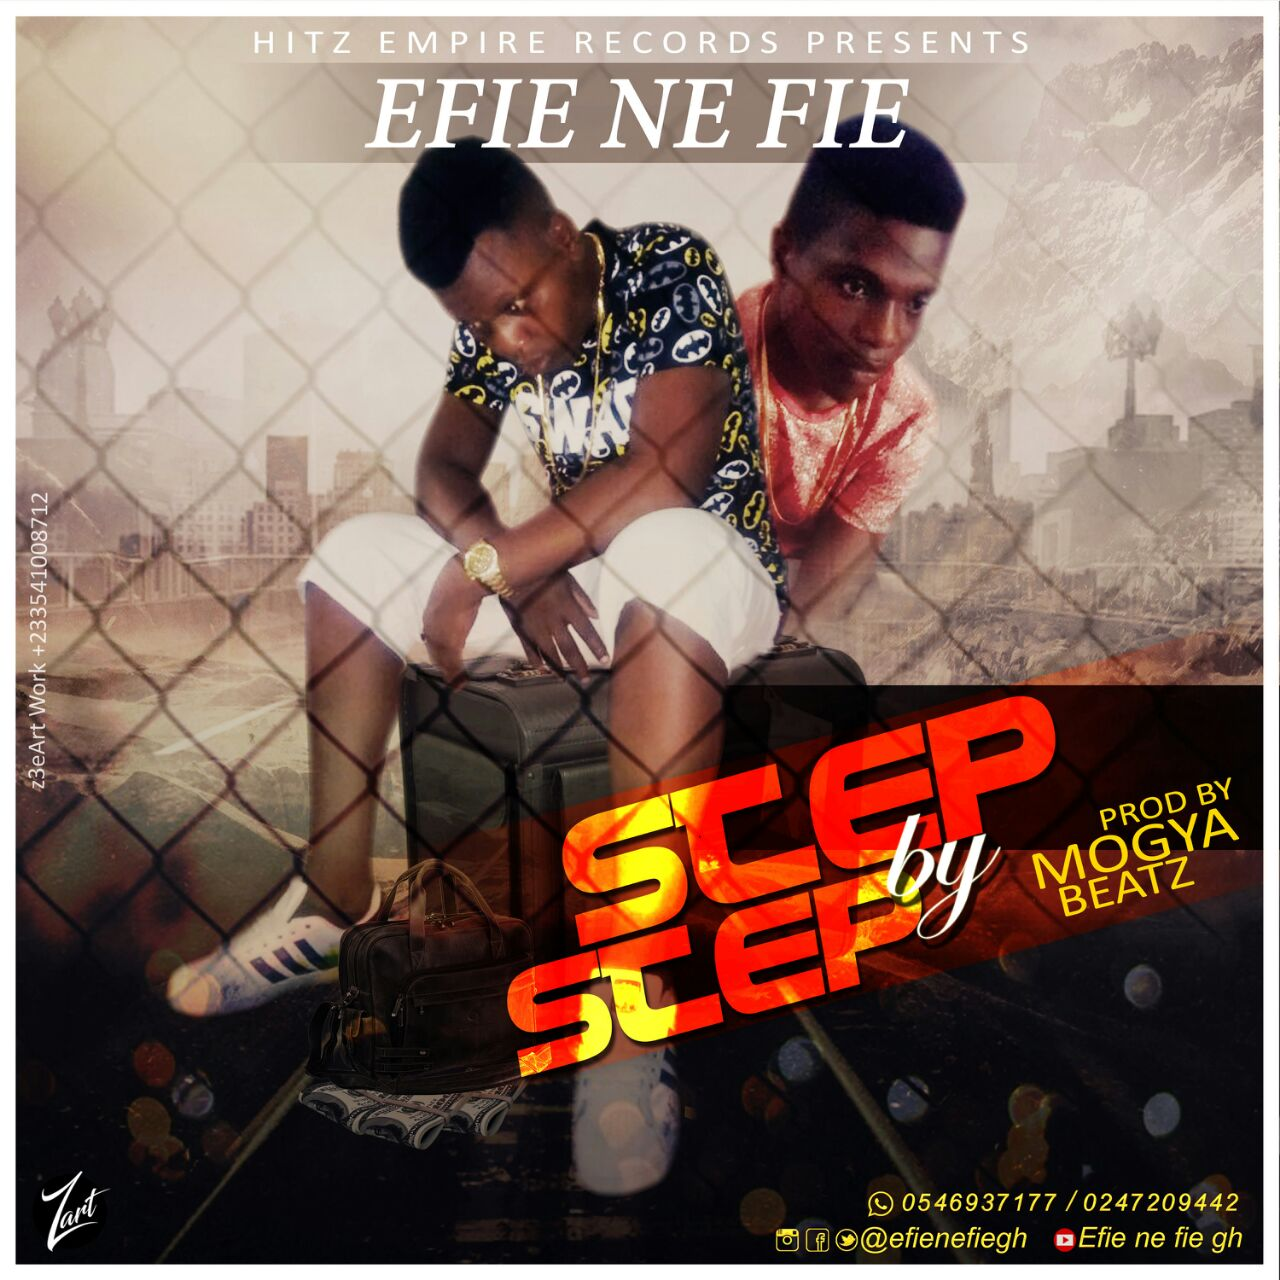 EFIE NE FIE 2 - AKAN GHANA MOVIES LATEST GHANAIAN MOVIES